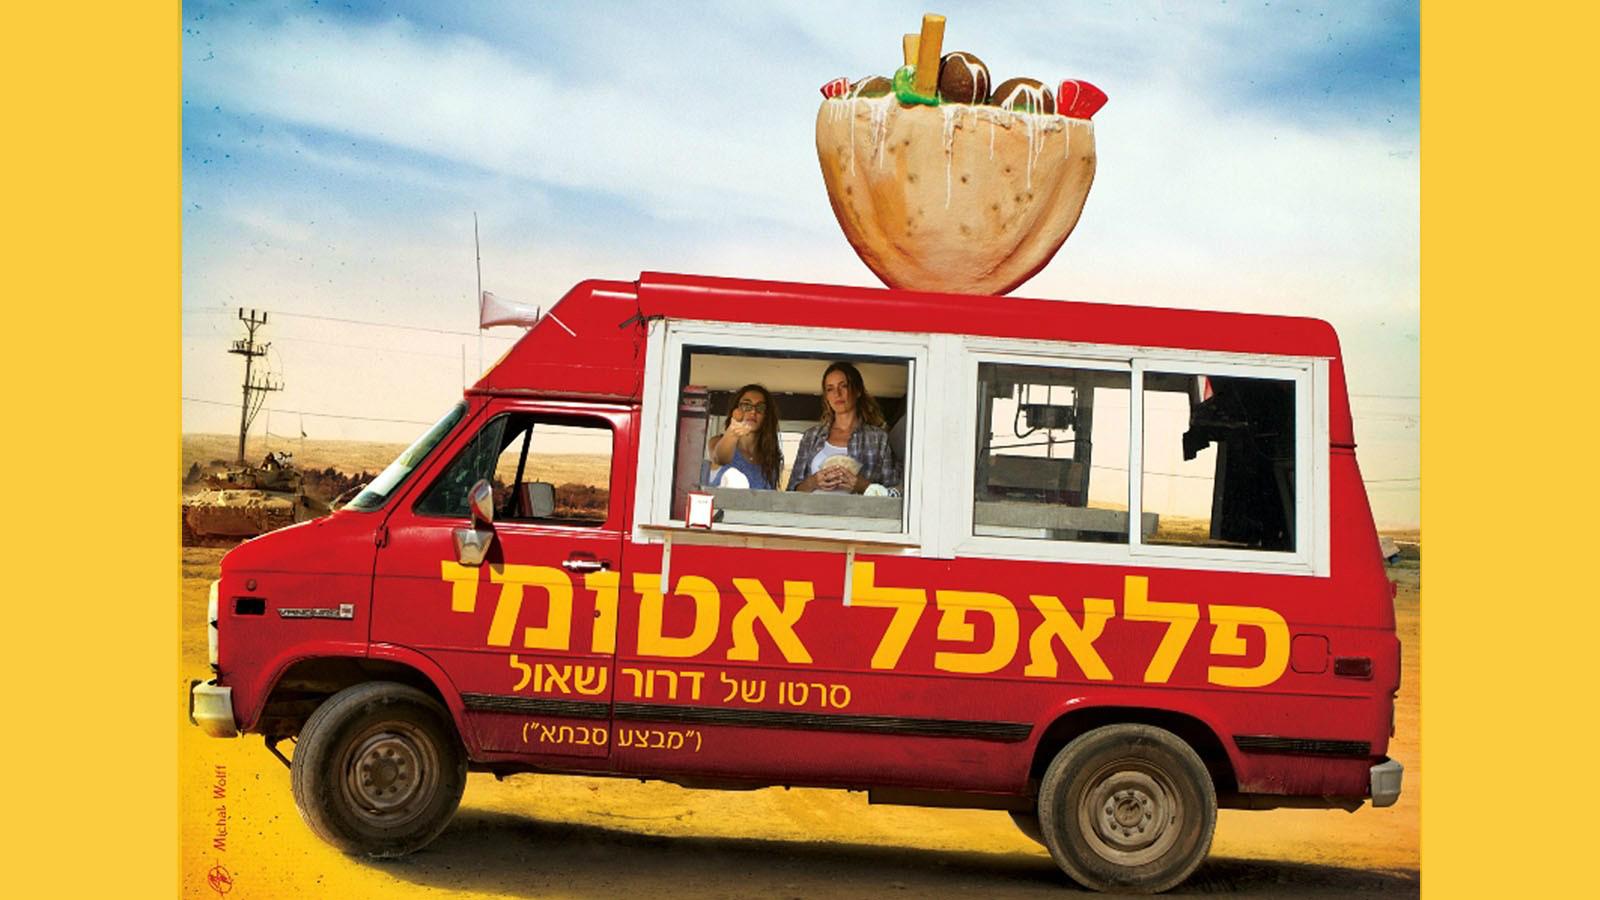 Atomic Falafel movie poster. Photo: courtesy